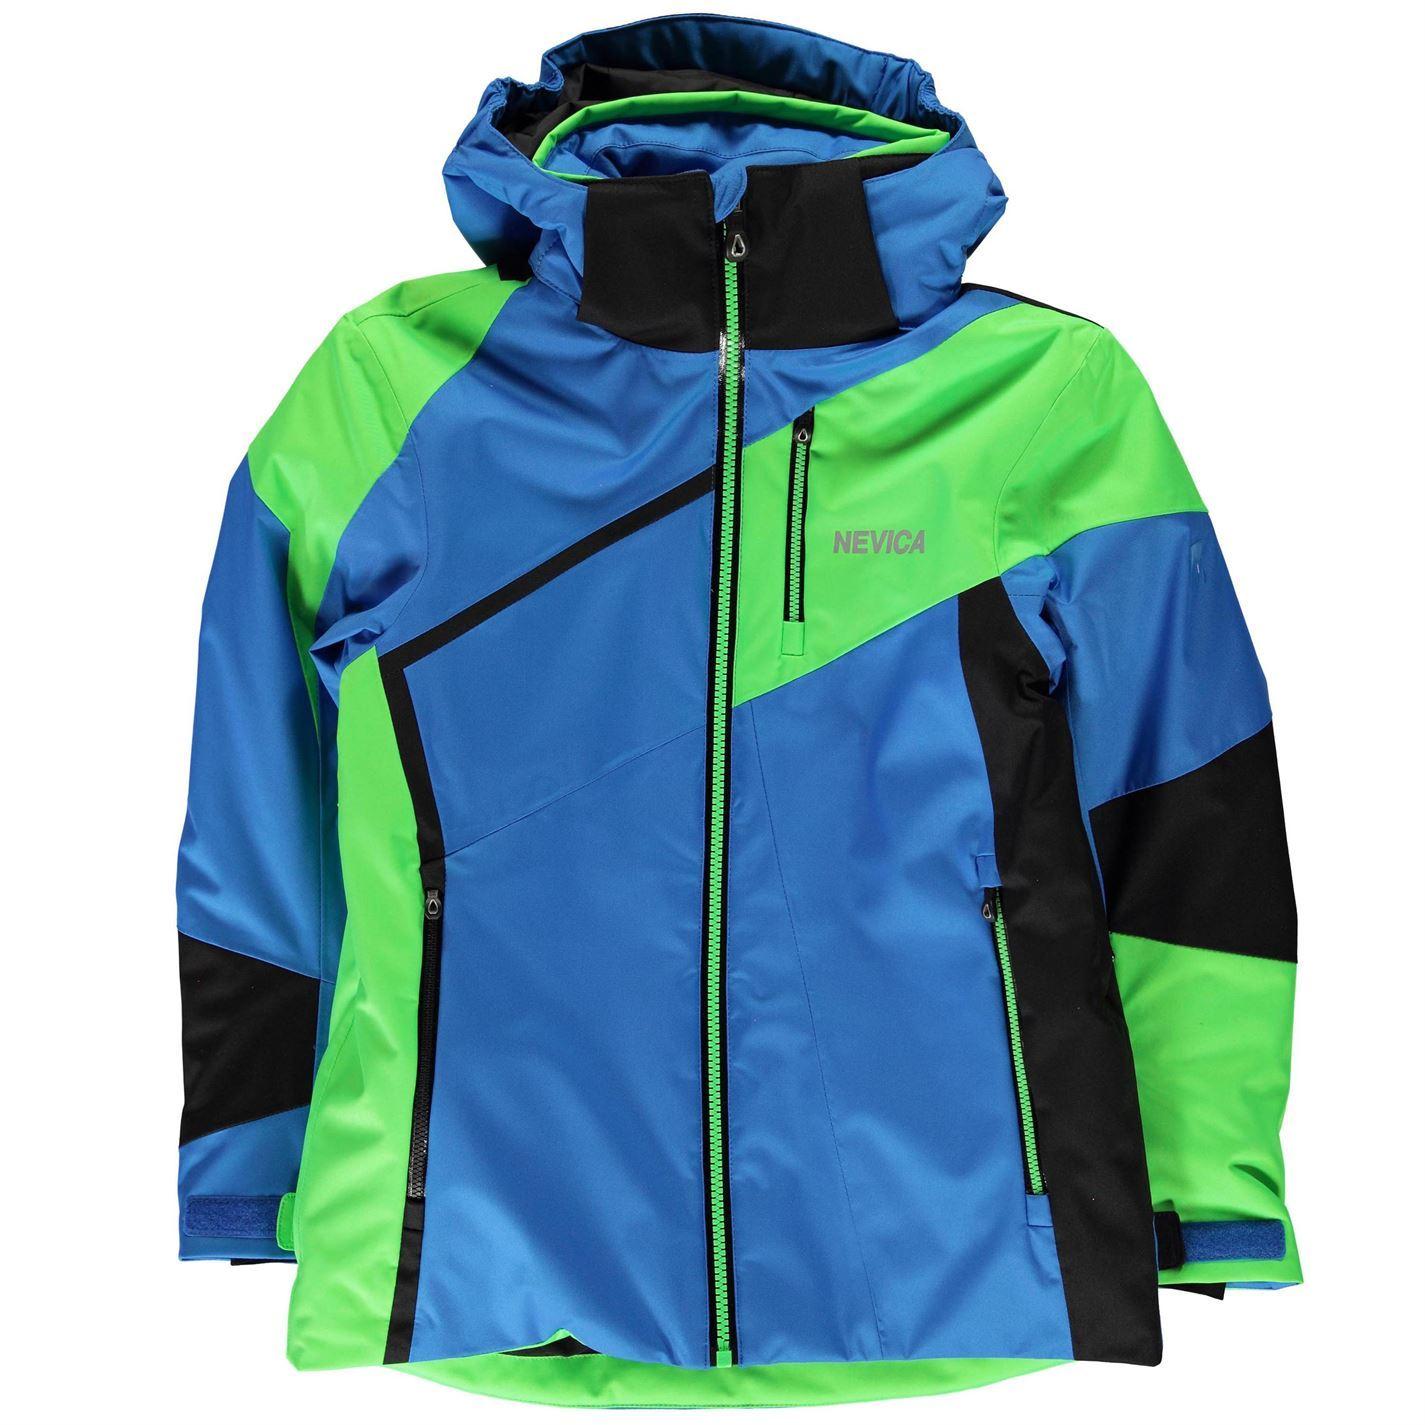 Nevica Vail Ski Jacket Junior Boys Snow Coat Skiing Outerwear  b1cc3c1c58c